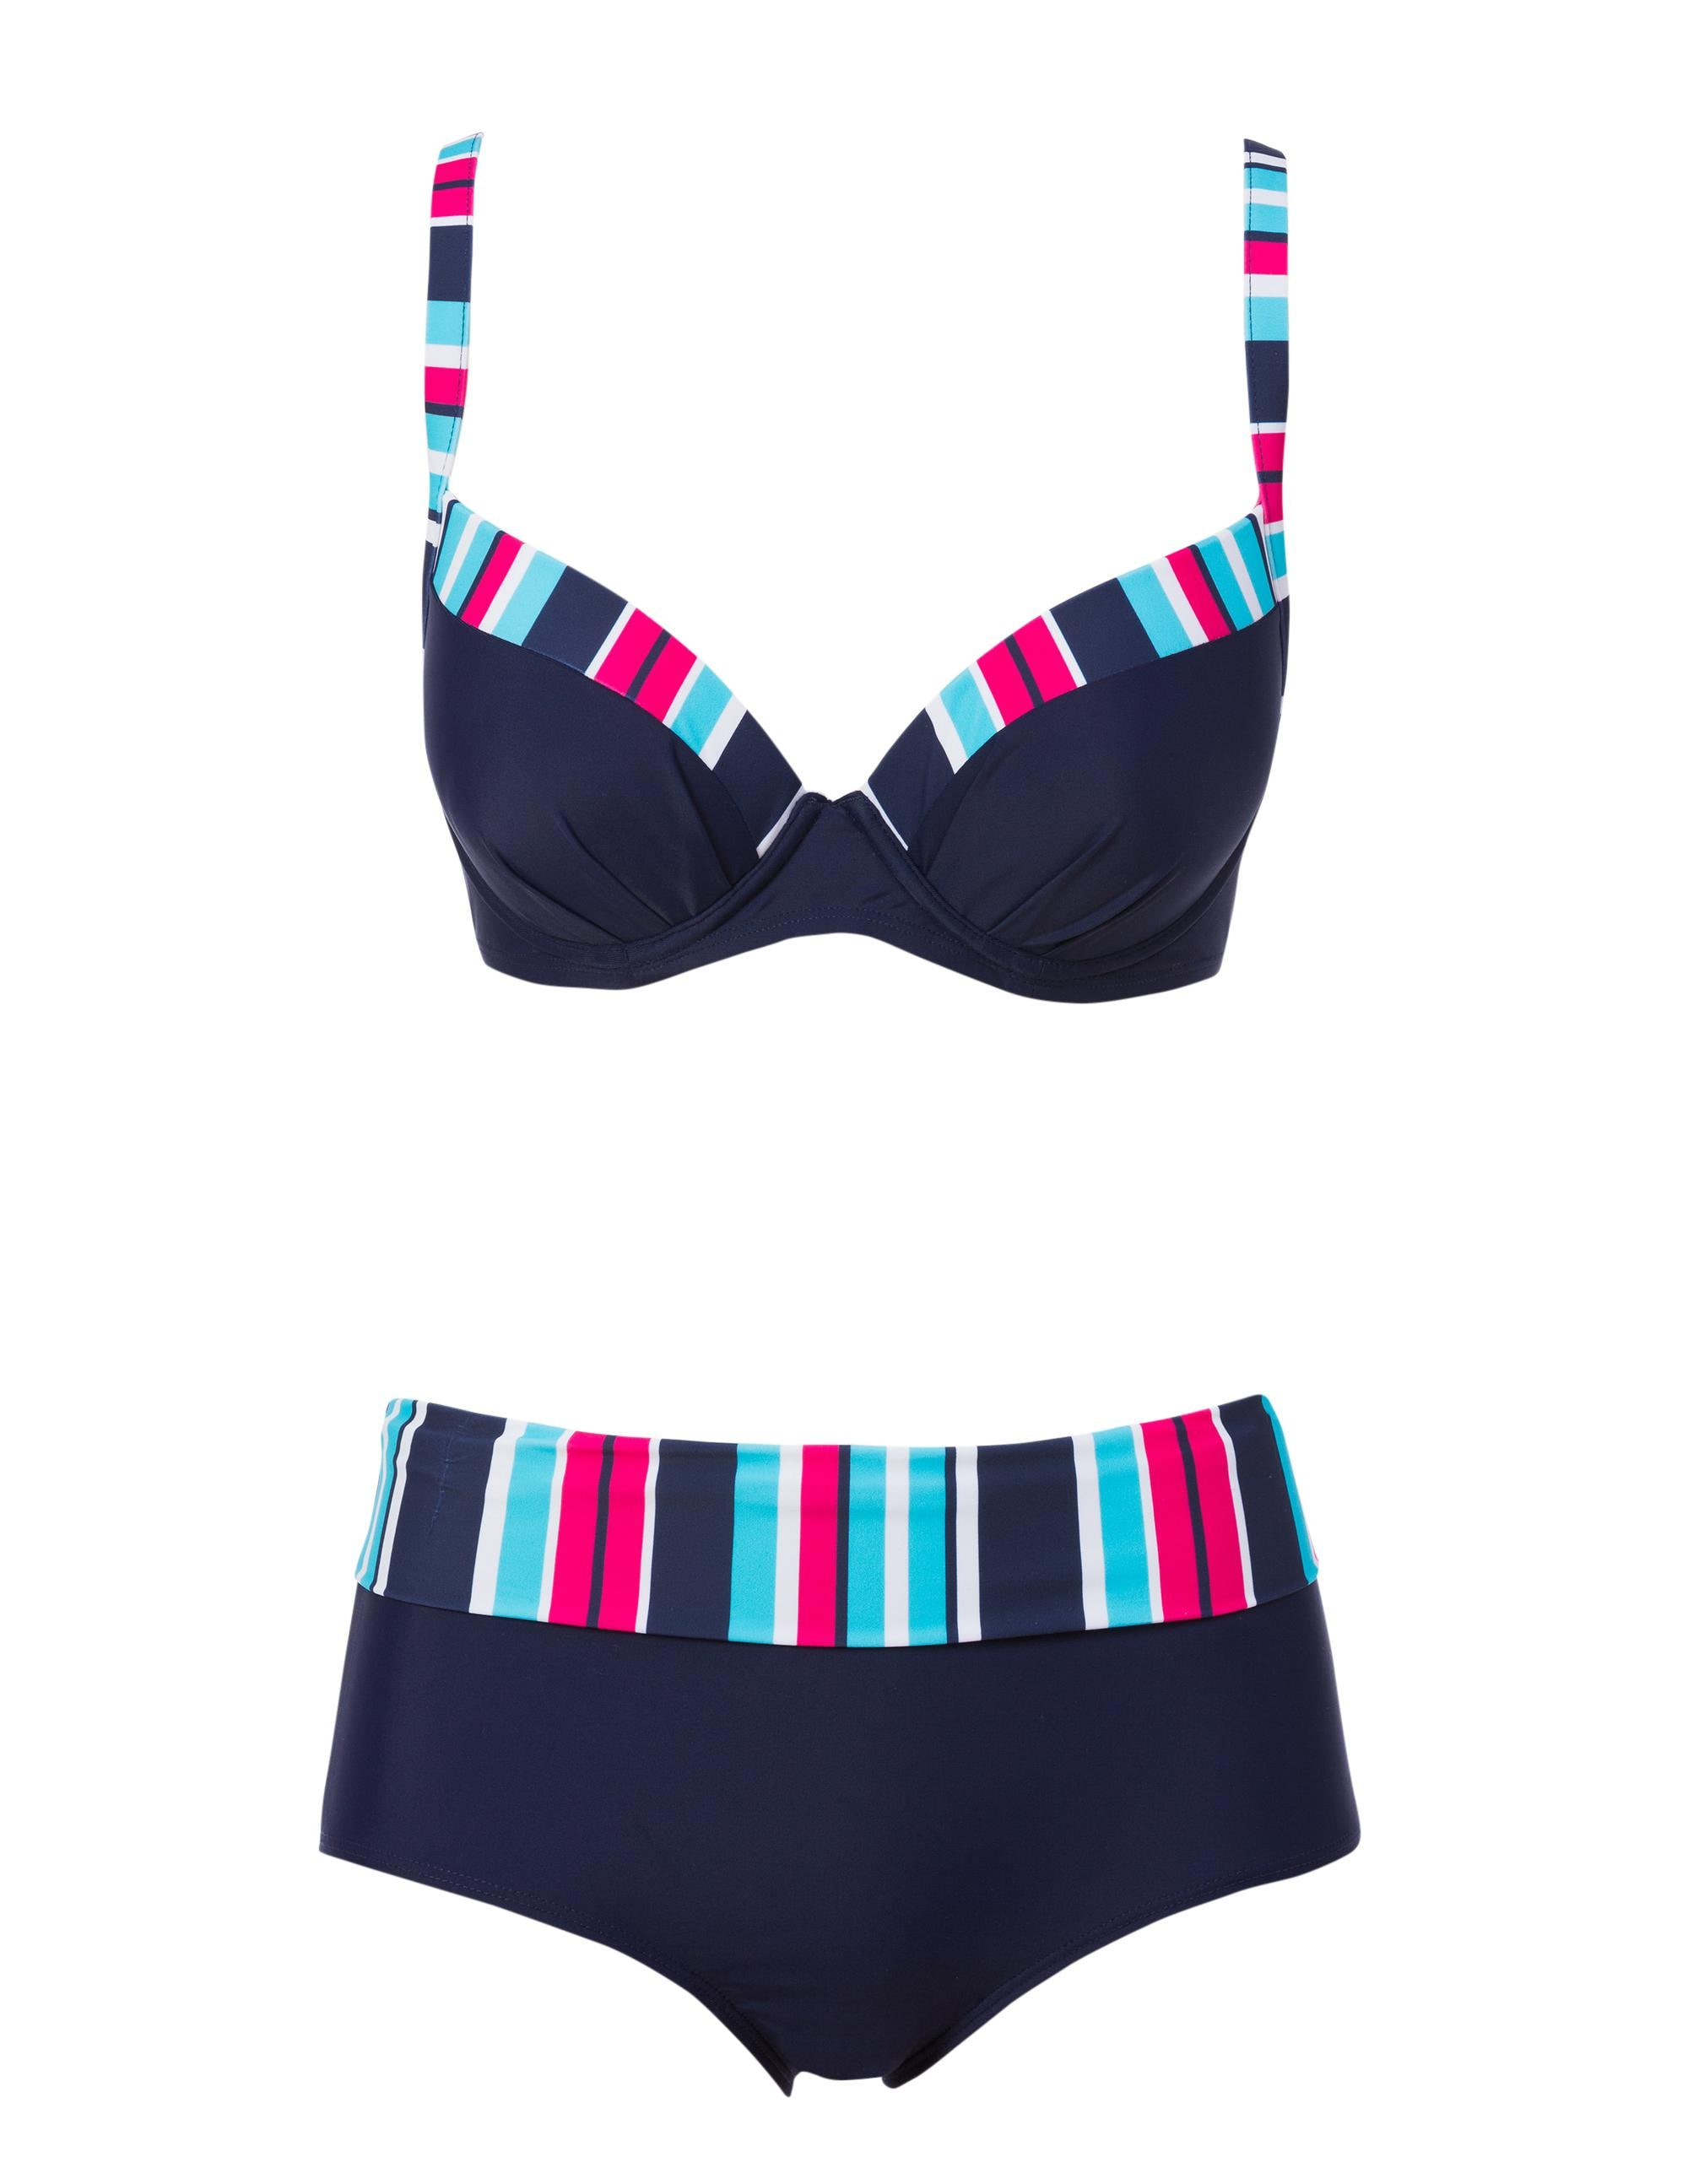 Bikini Bygel-Bh & Miditrosa Marin